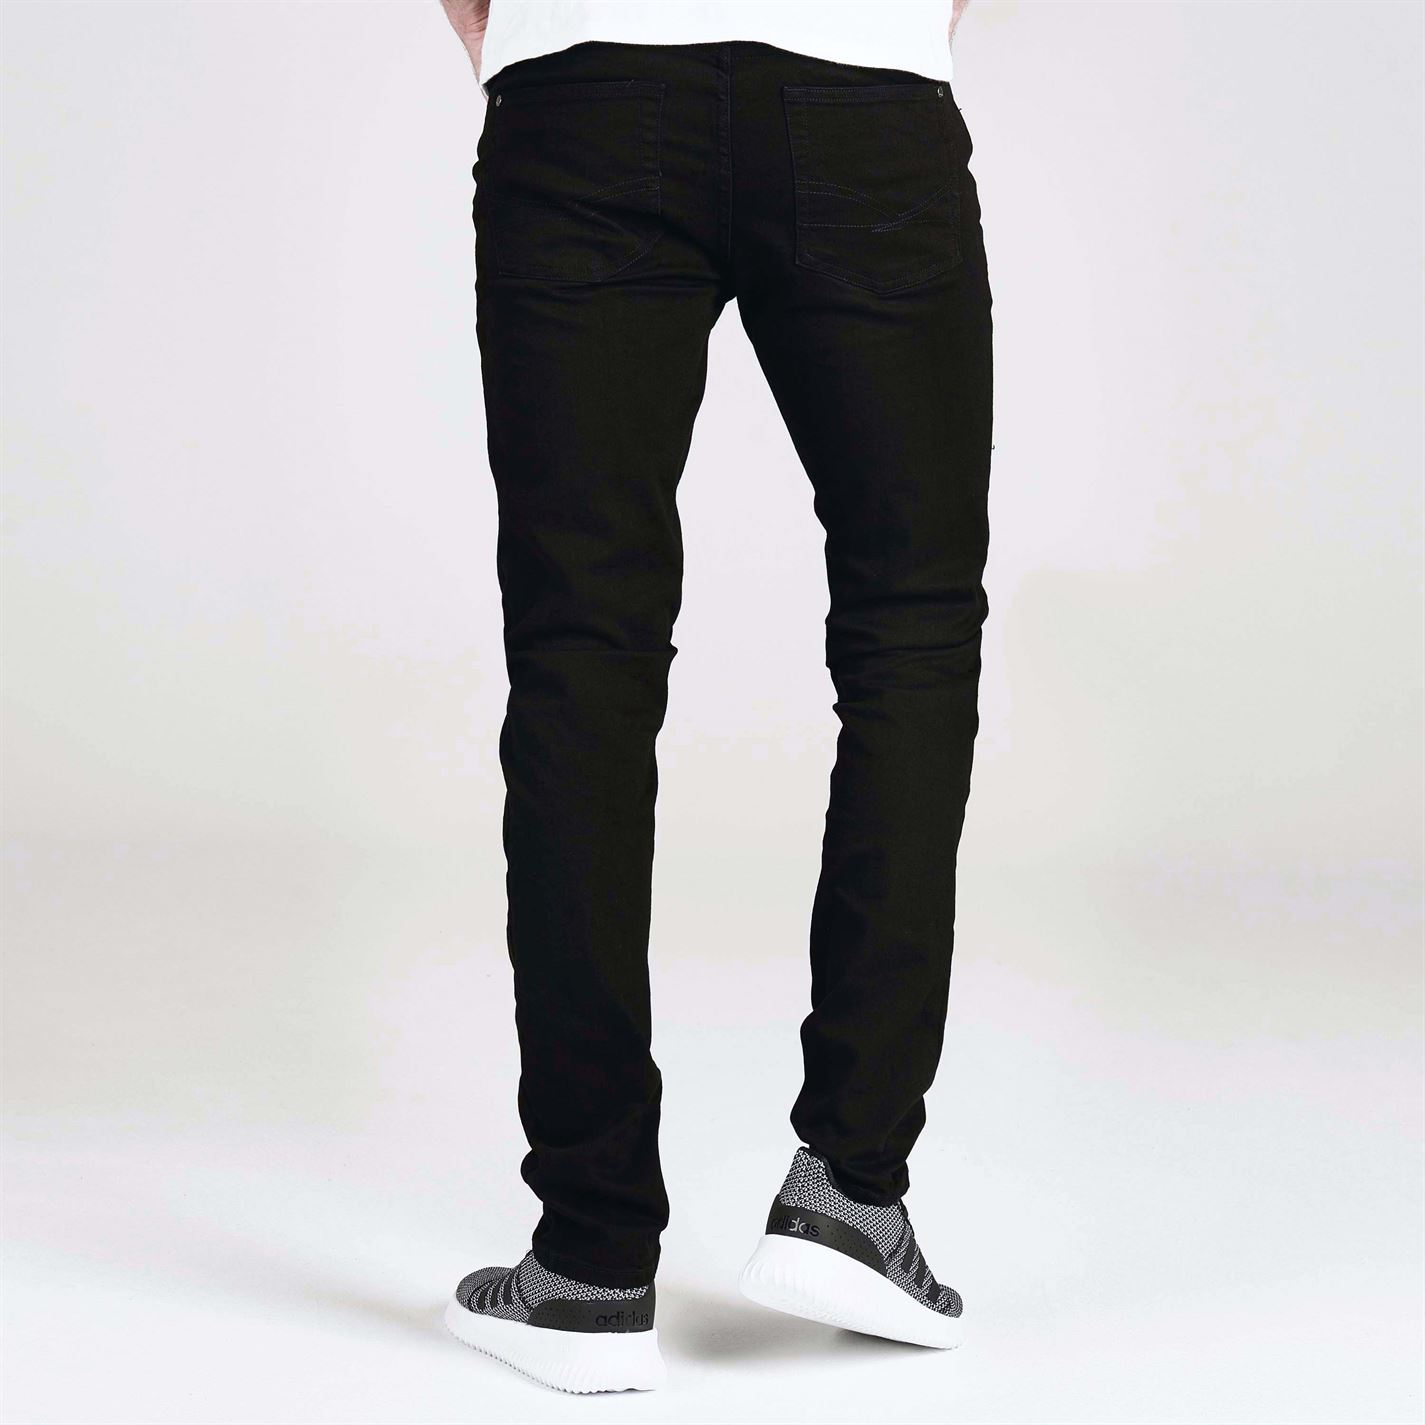 Jeans-Denim-Firetrap-Skinny-Mens-Trouser-Black thumbnail 16